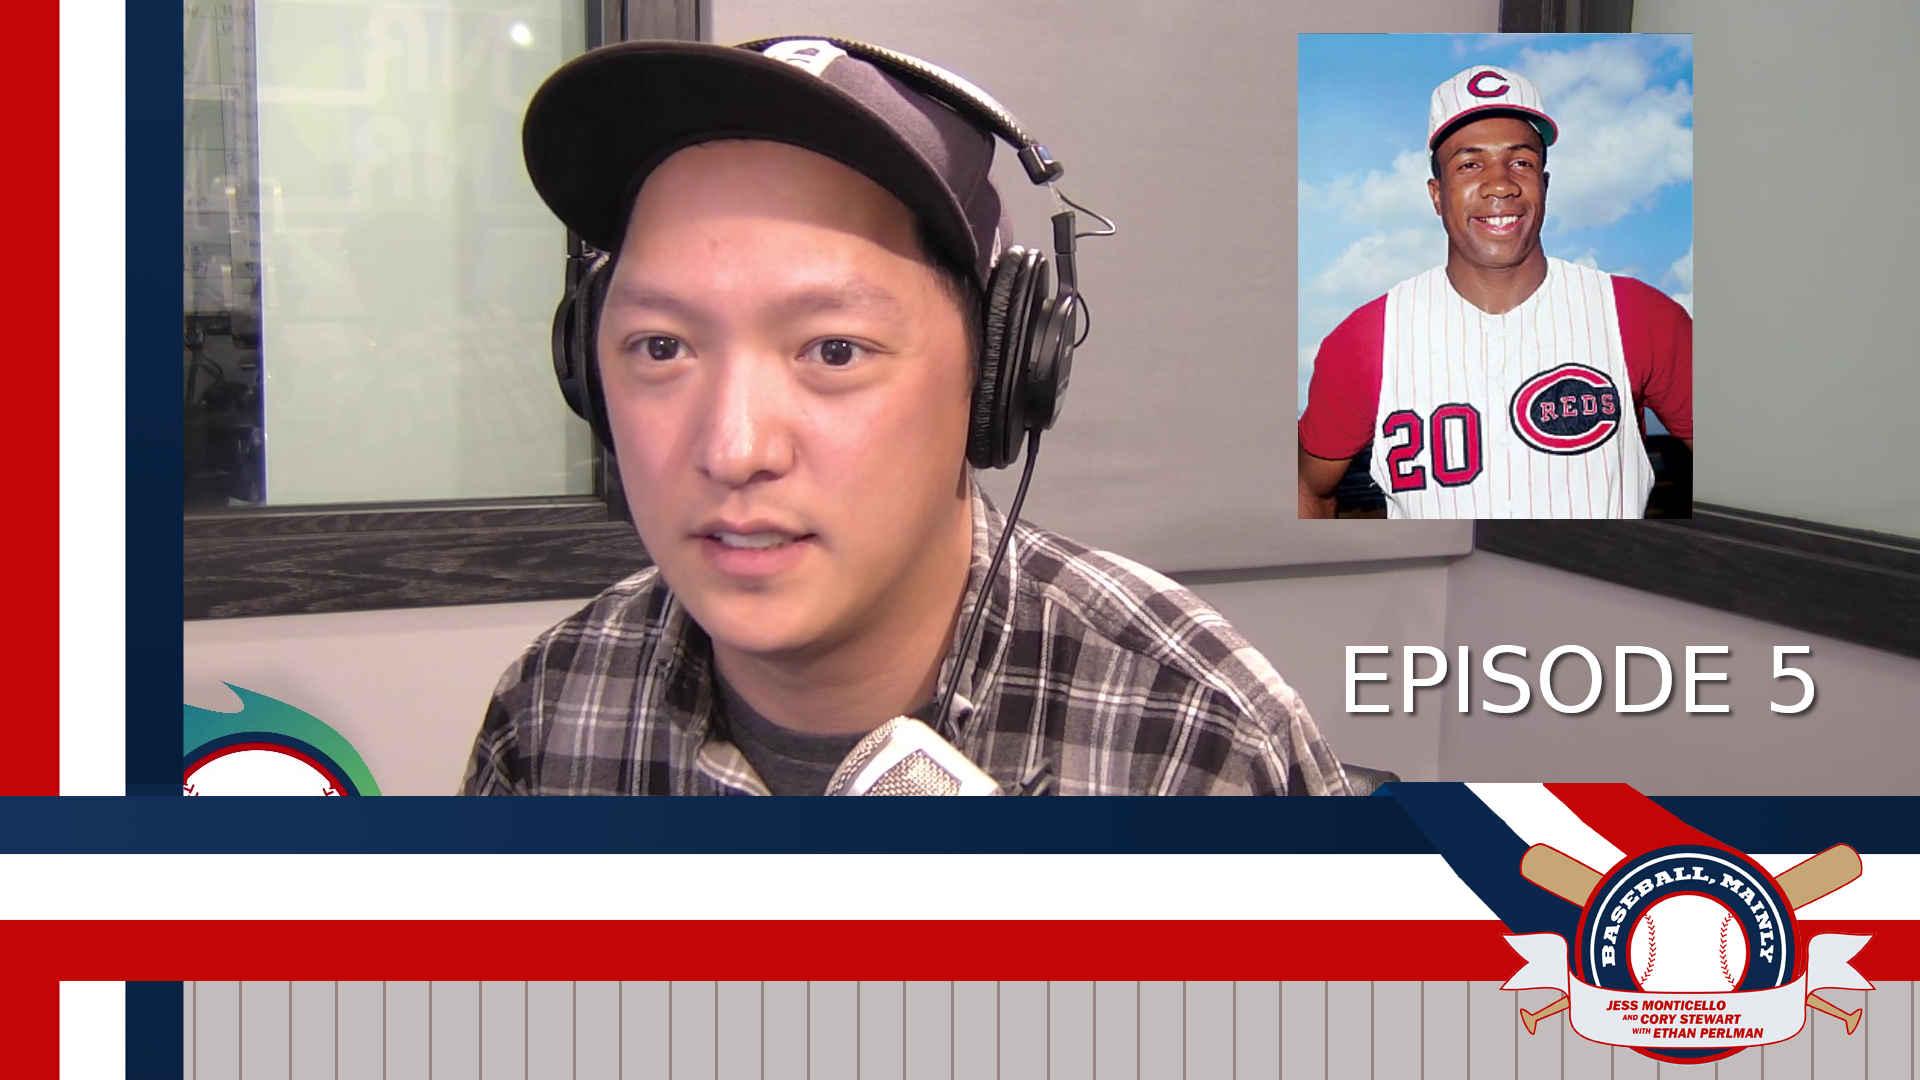 Baseball, Mainly - Episode 5